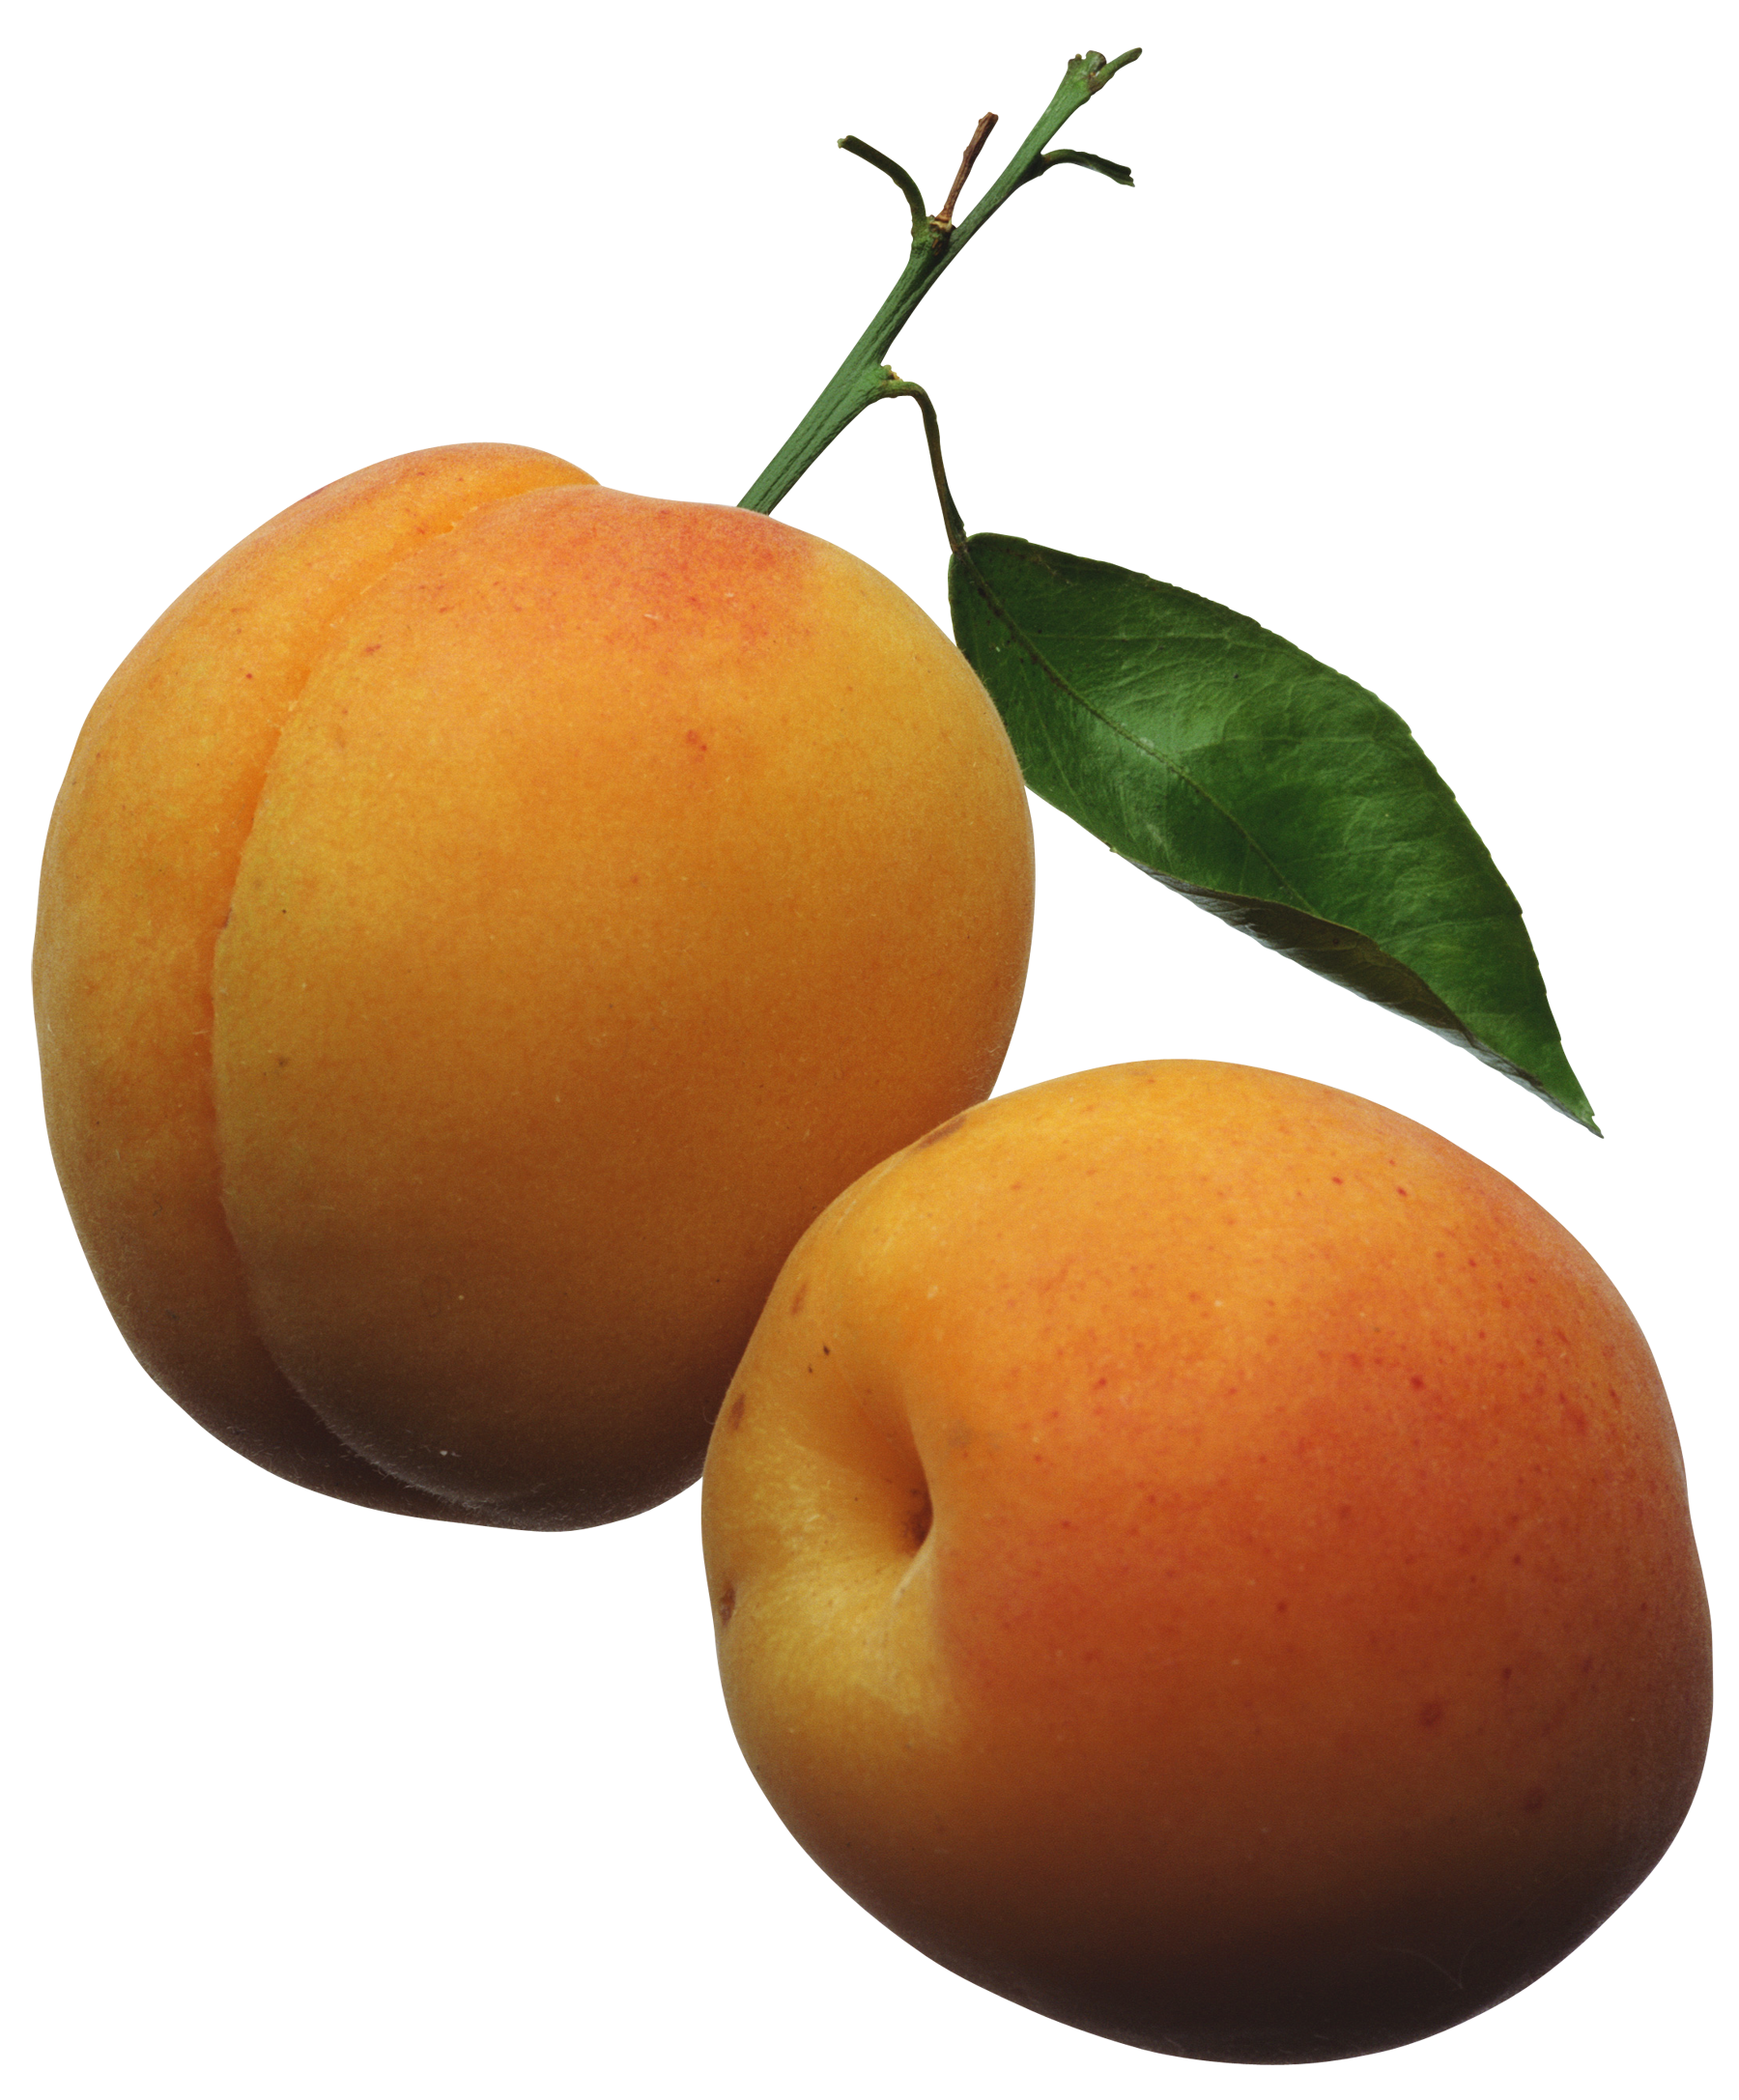 Apricot Clipart | Clipart Panda - Free Clipart Images